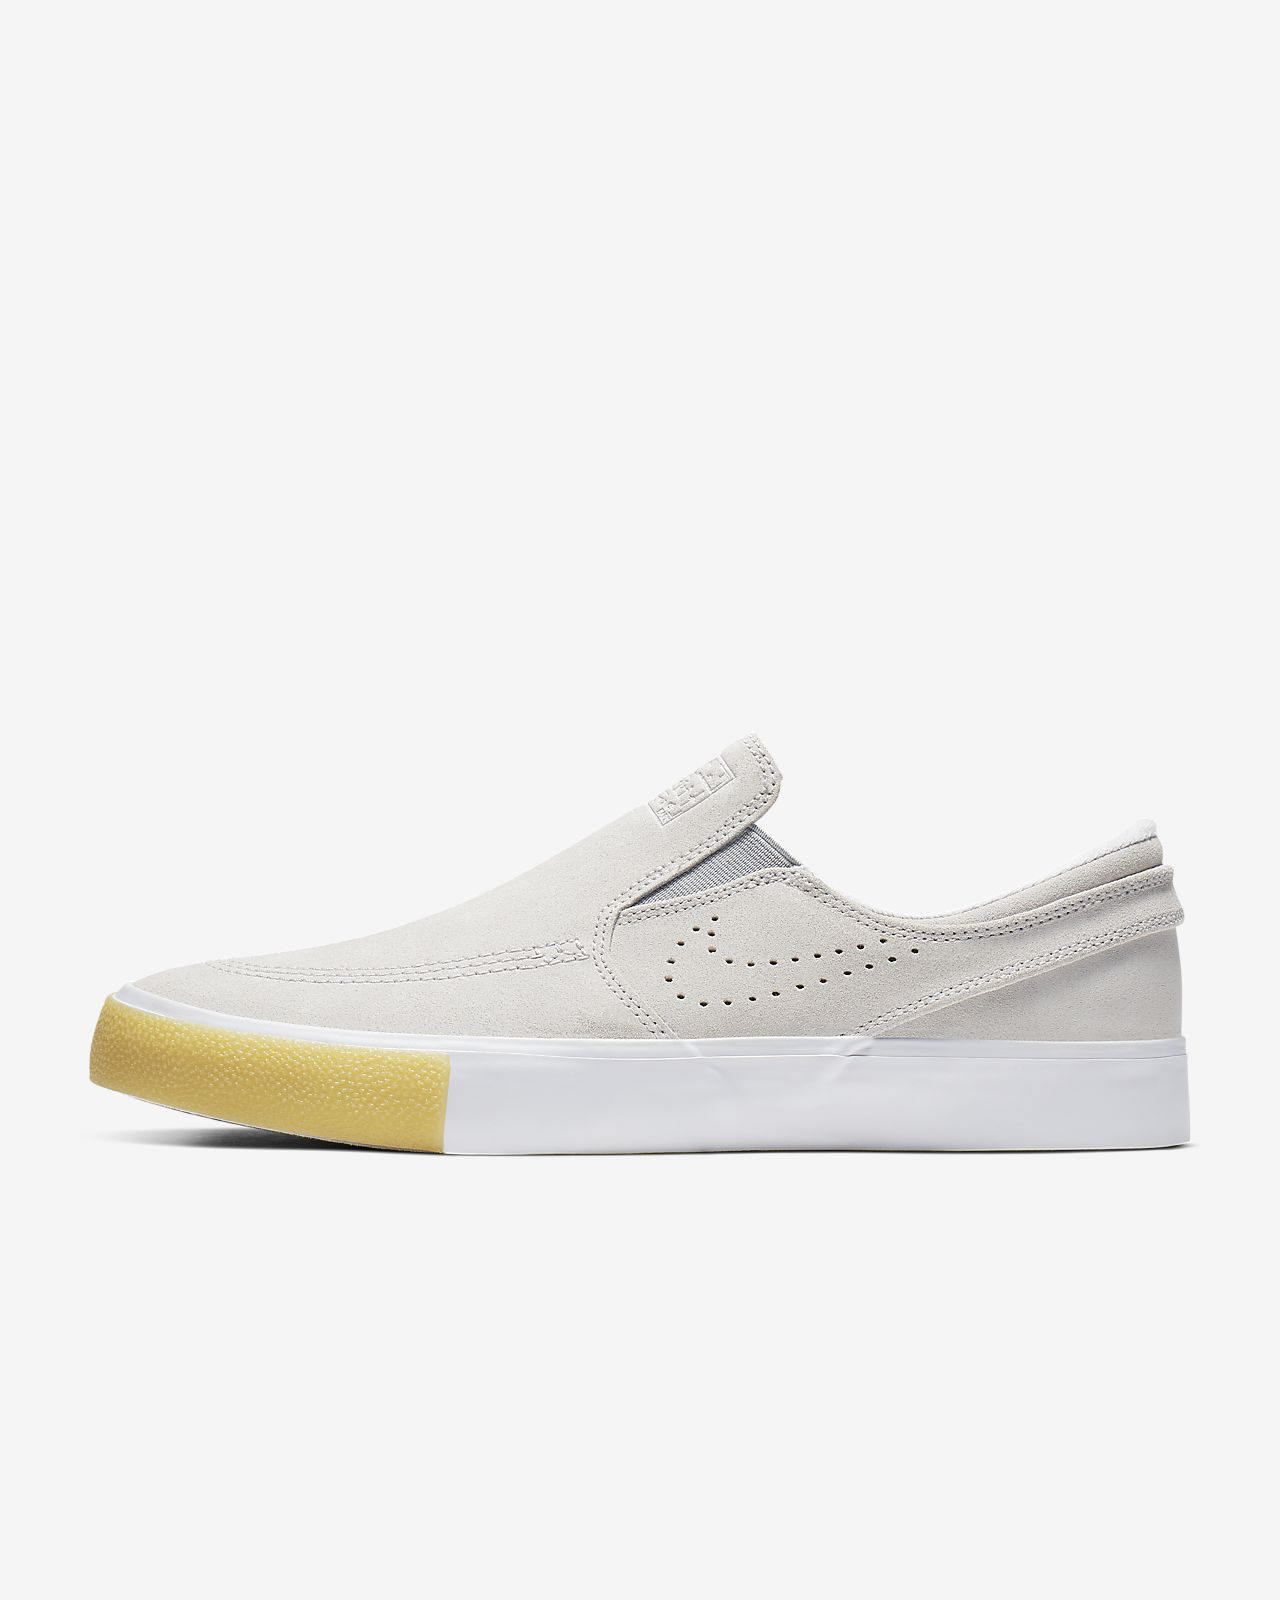 Nike SB Zoom Stefan Janoski Slip RM SE 滑板鞋